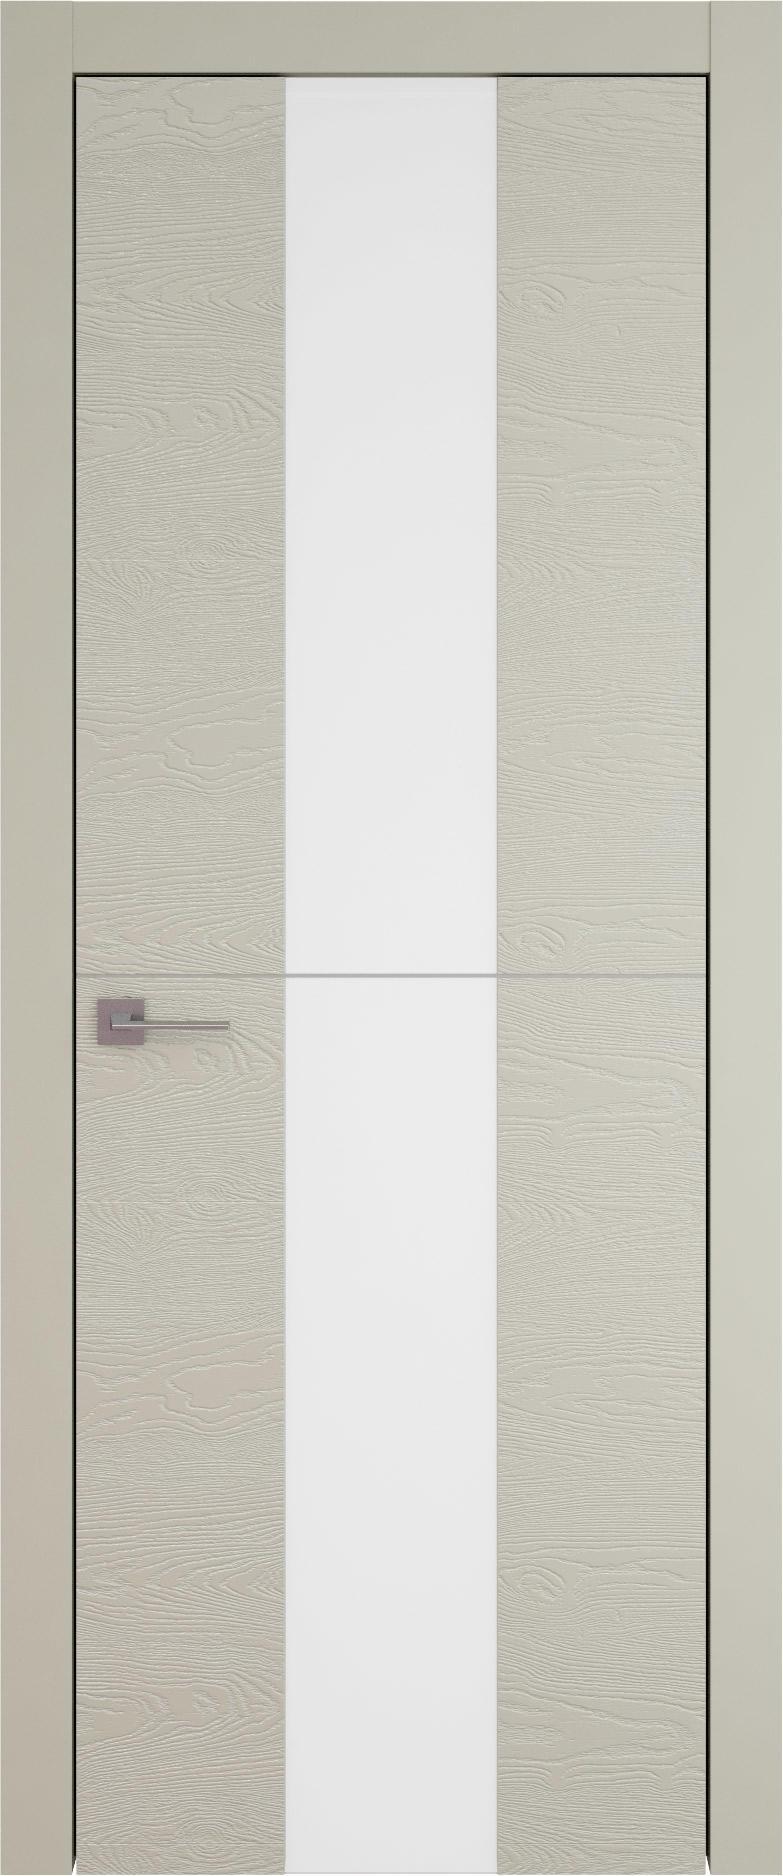 Tivoli Ж-3 цвет - Серо-оливковая эмаль по шпону (RAL 7032) Со стеклом (ДО)